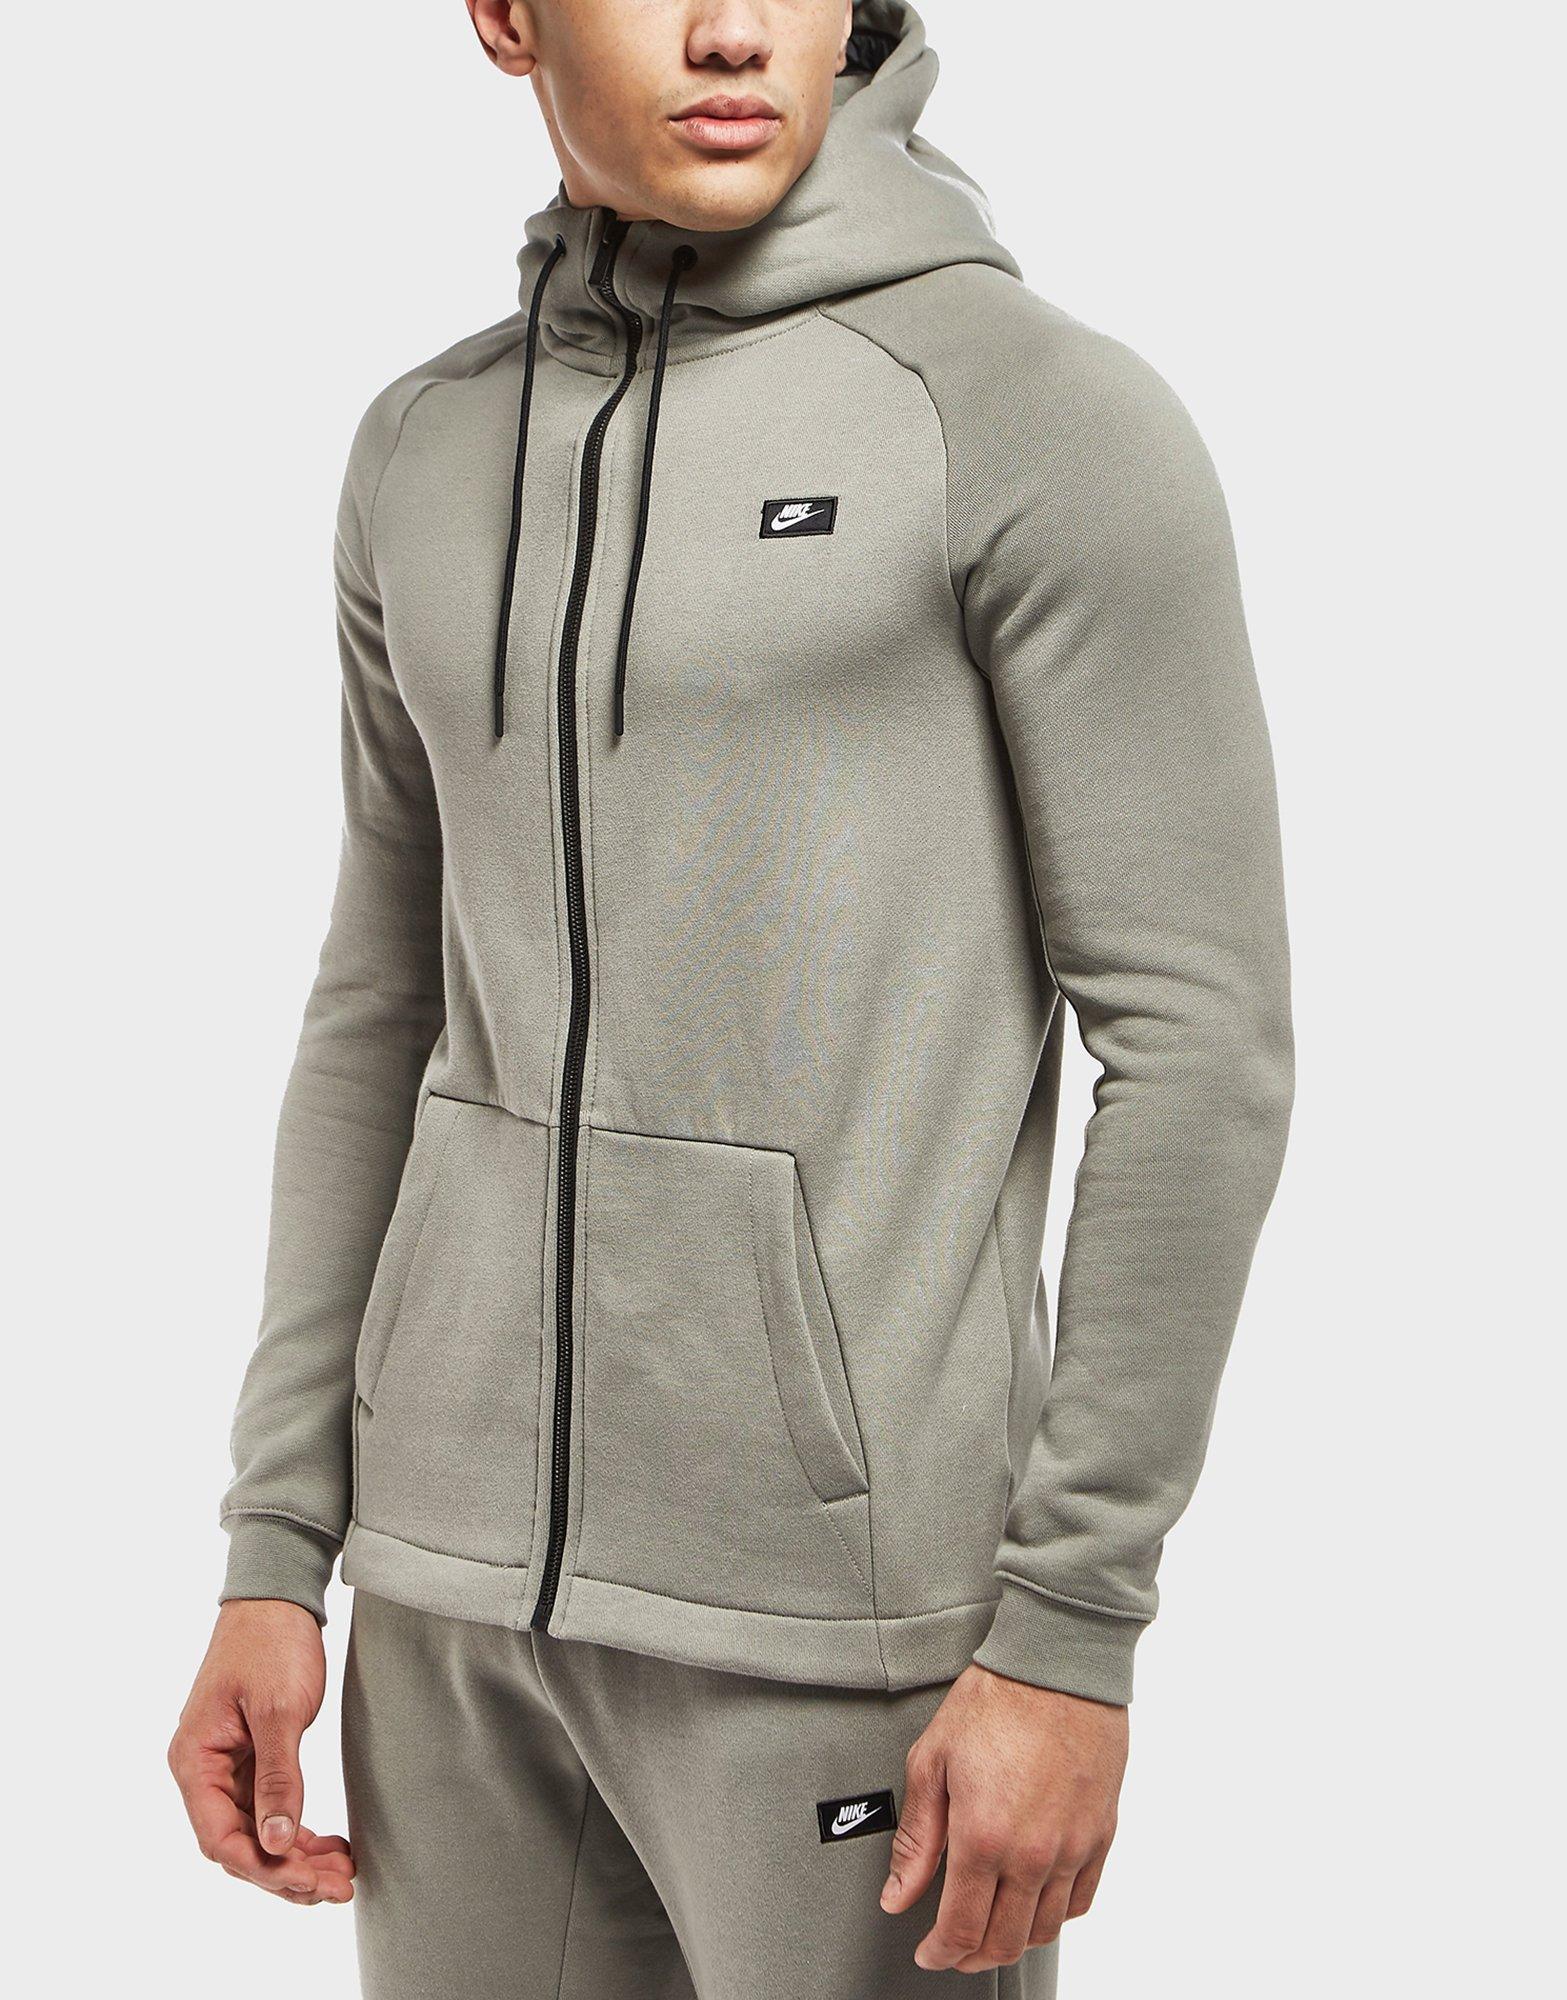 Nike AW77 BB Tech Mens Full Zip Hoody Sportswear Mens Sportswear COLOUR-grey/red